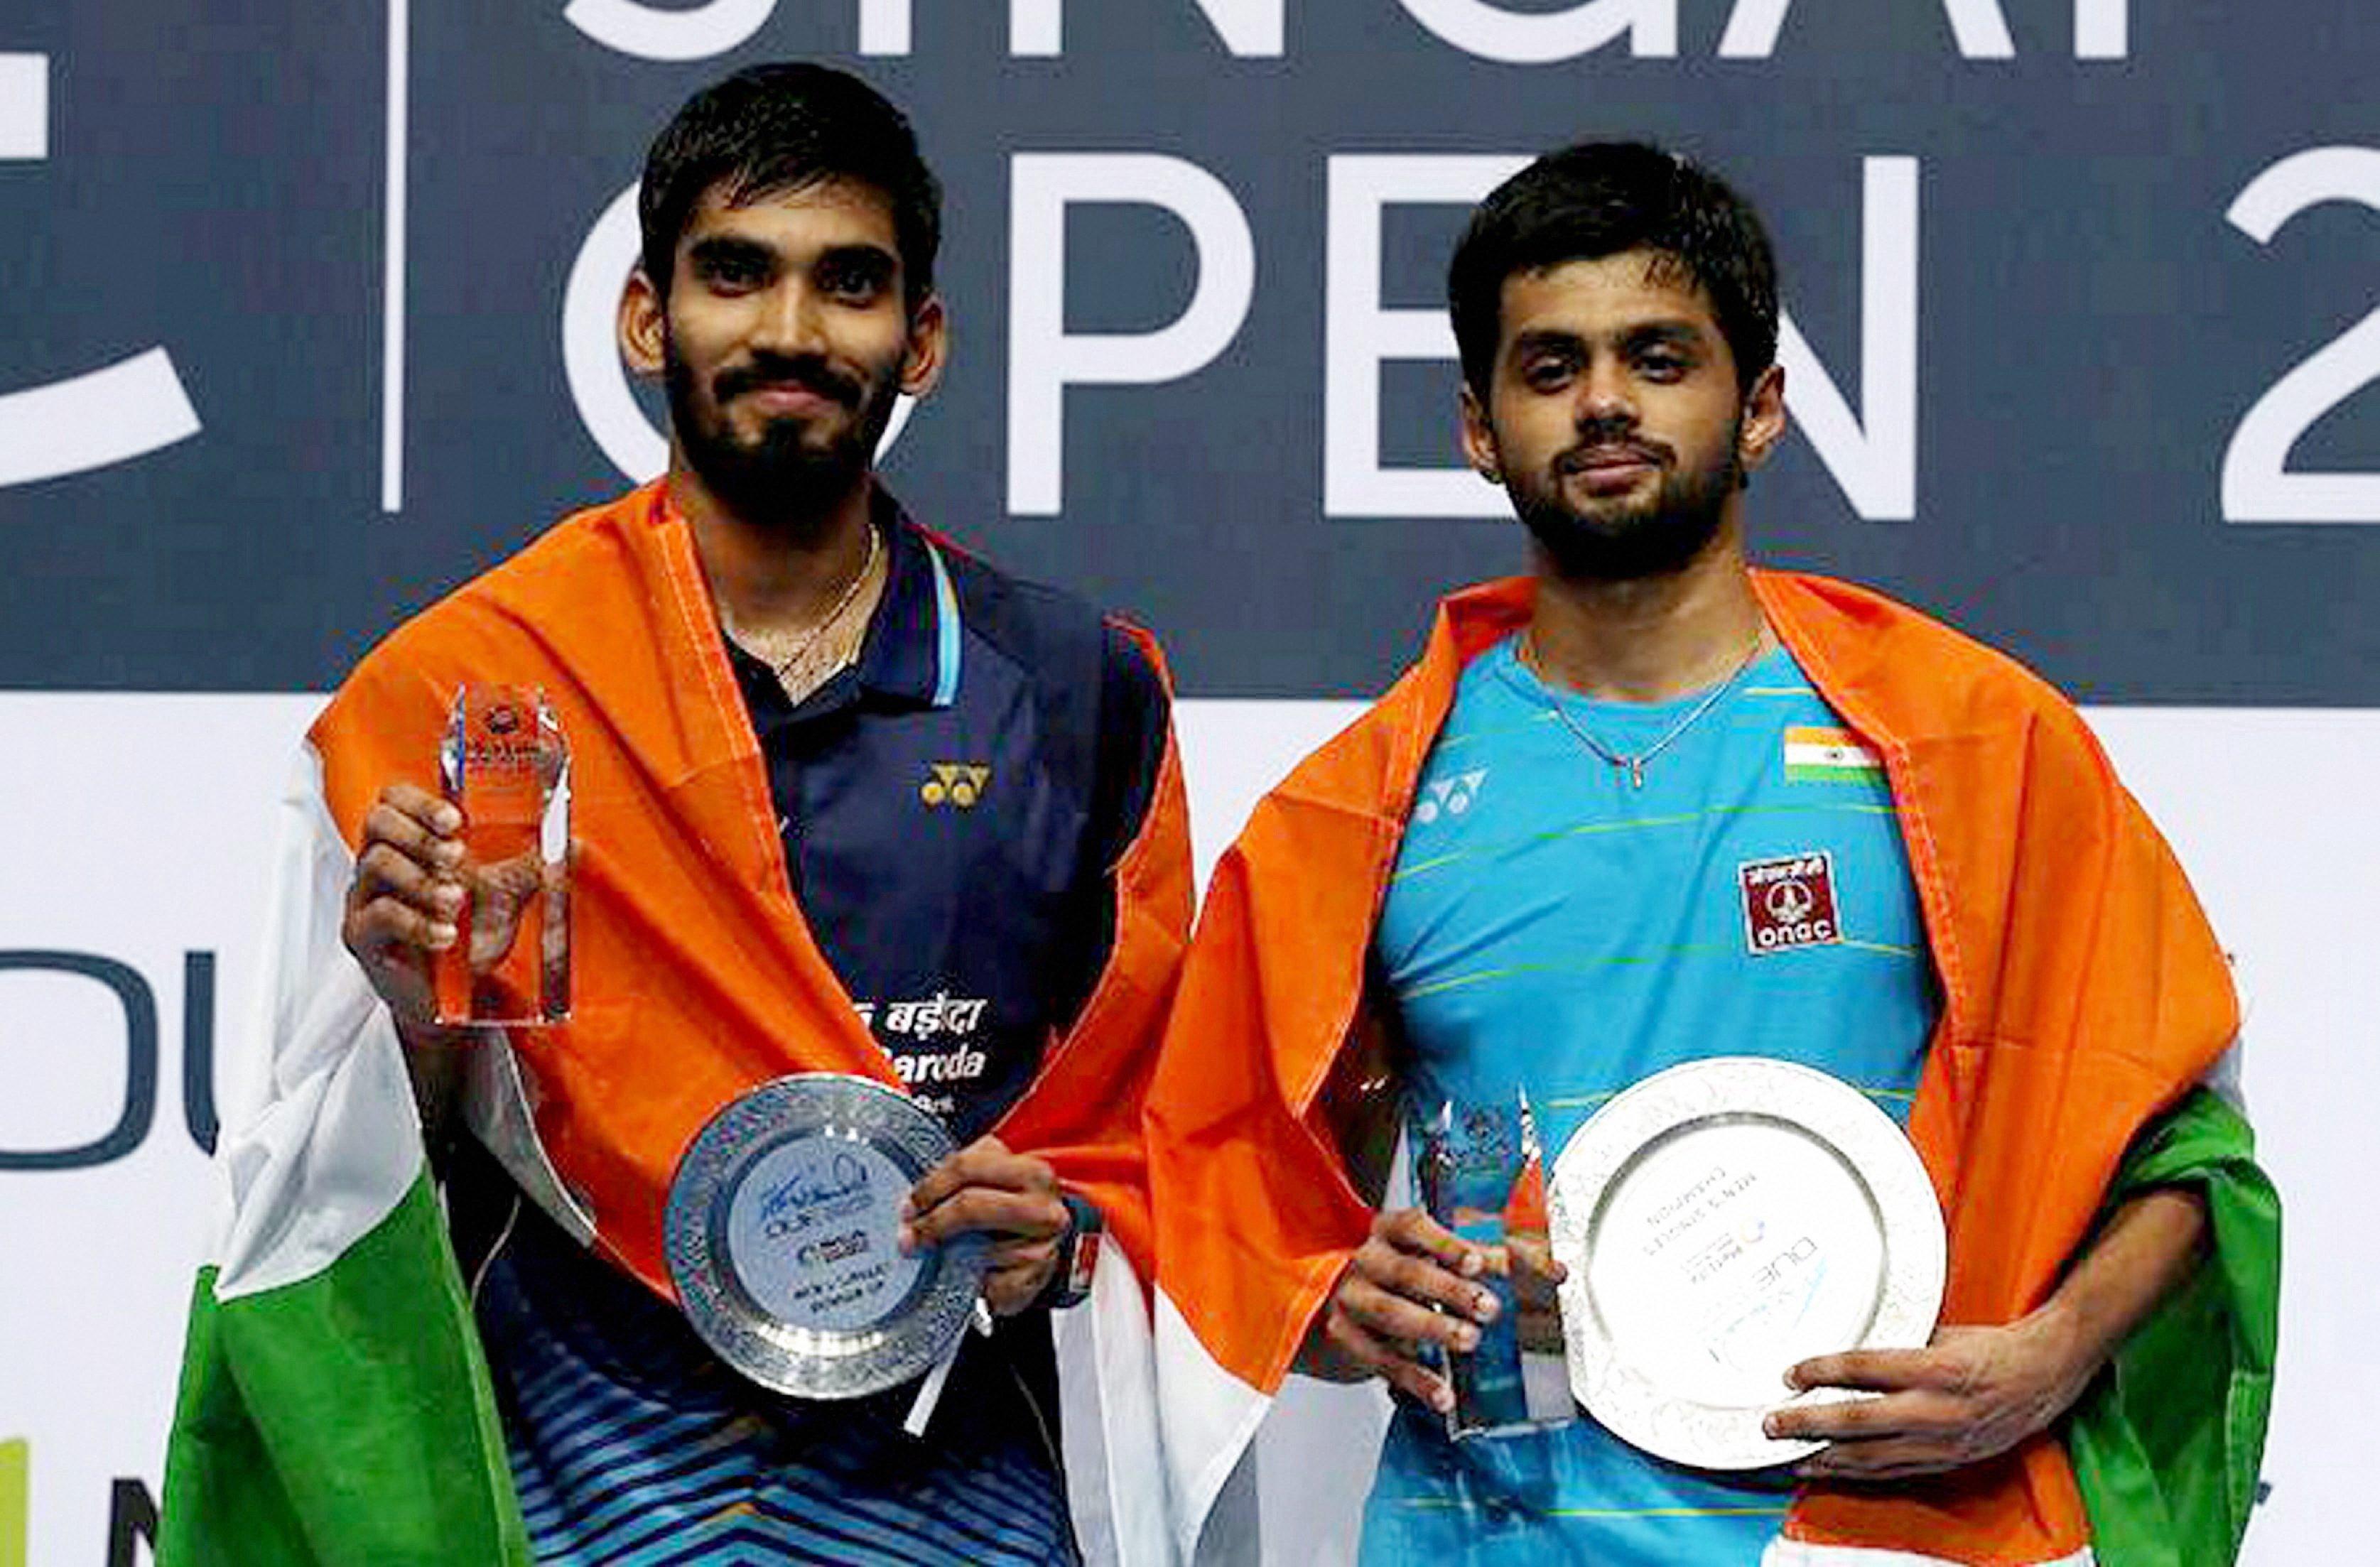 Sai Praneeth & Srikanth Created Indian Badminton History But